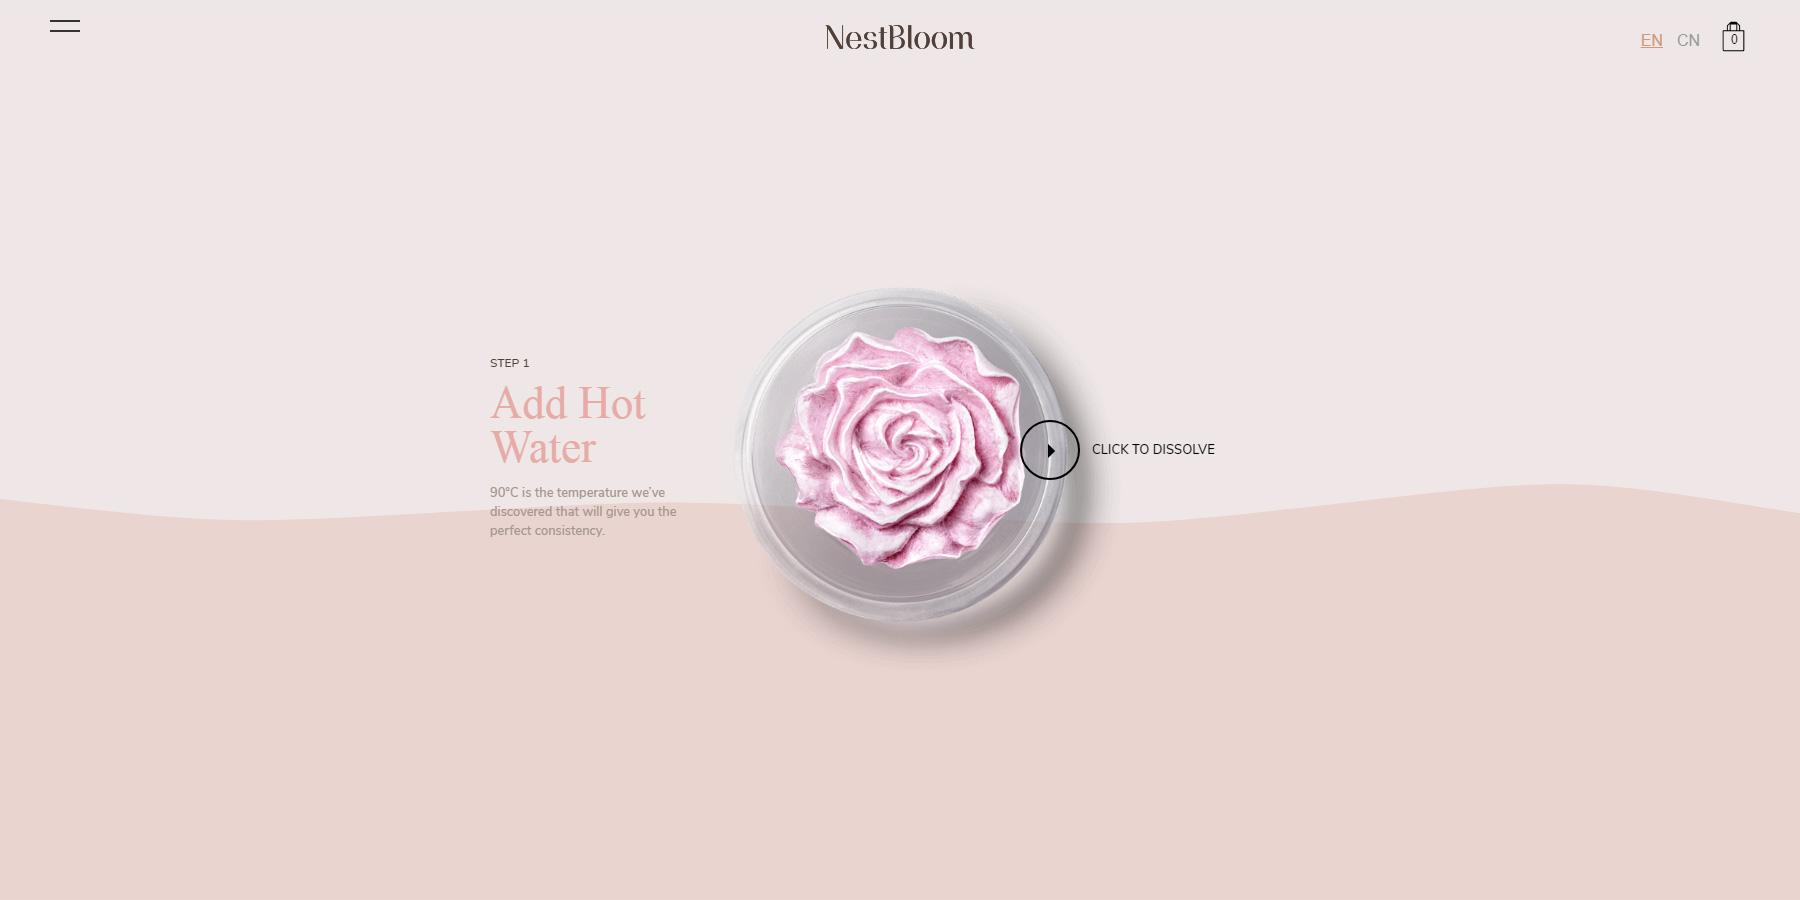 NestBloom - Website of the Day